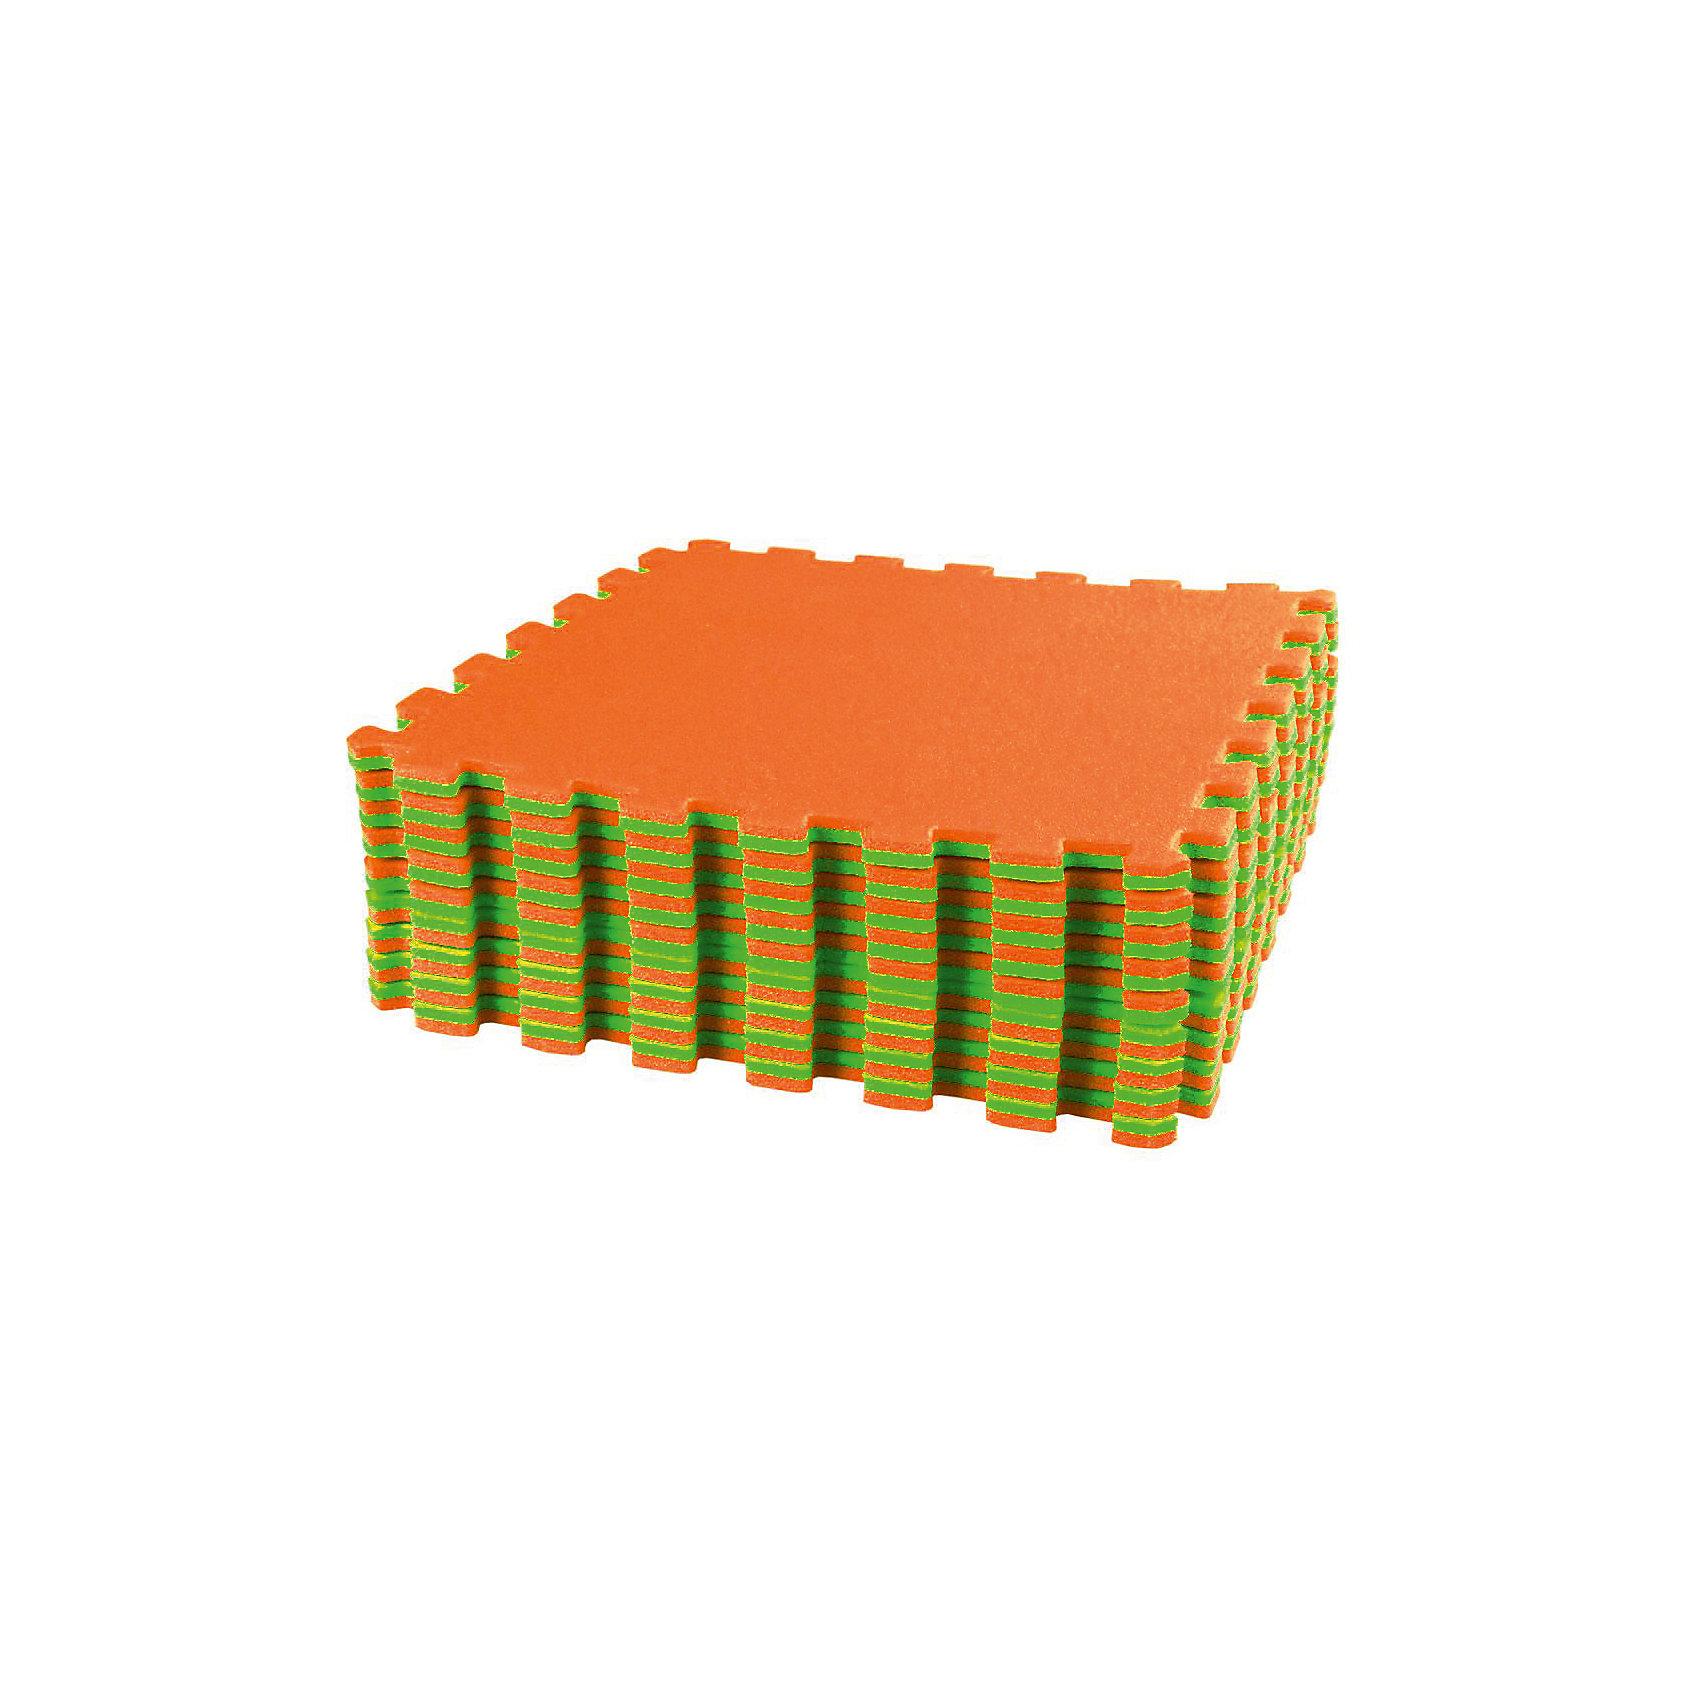 Alternativa Коврик спортивный (1270х1270), Alternativa, салатовый-оранжевый alternativa горка для купания alternativa розовый